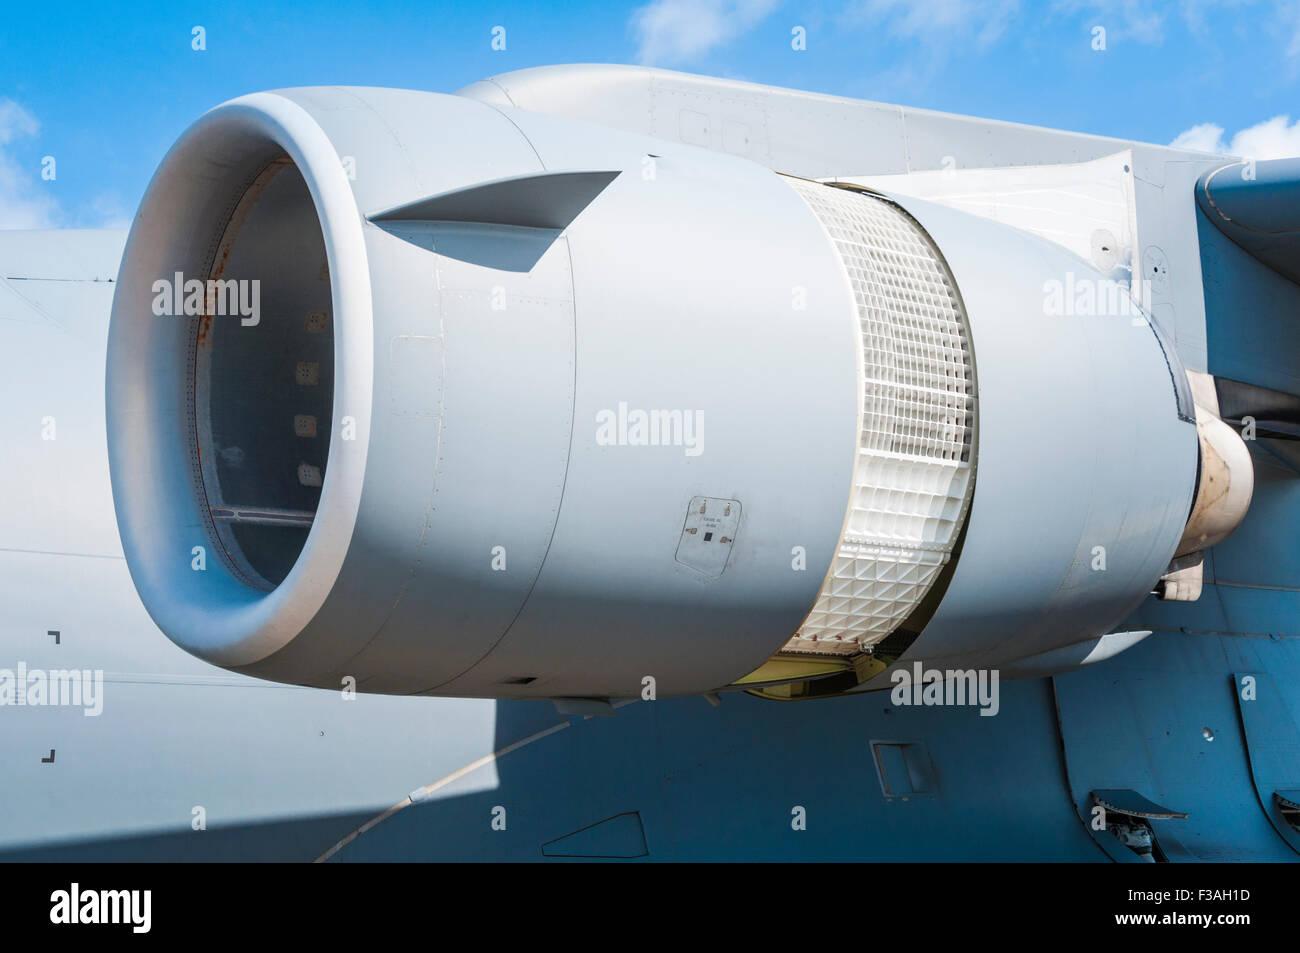 The port inner engine of a McDonnell Douglas/Boeing C-17 Globemaster III configured for reverse thrust - Stock Image